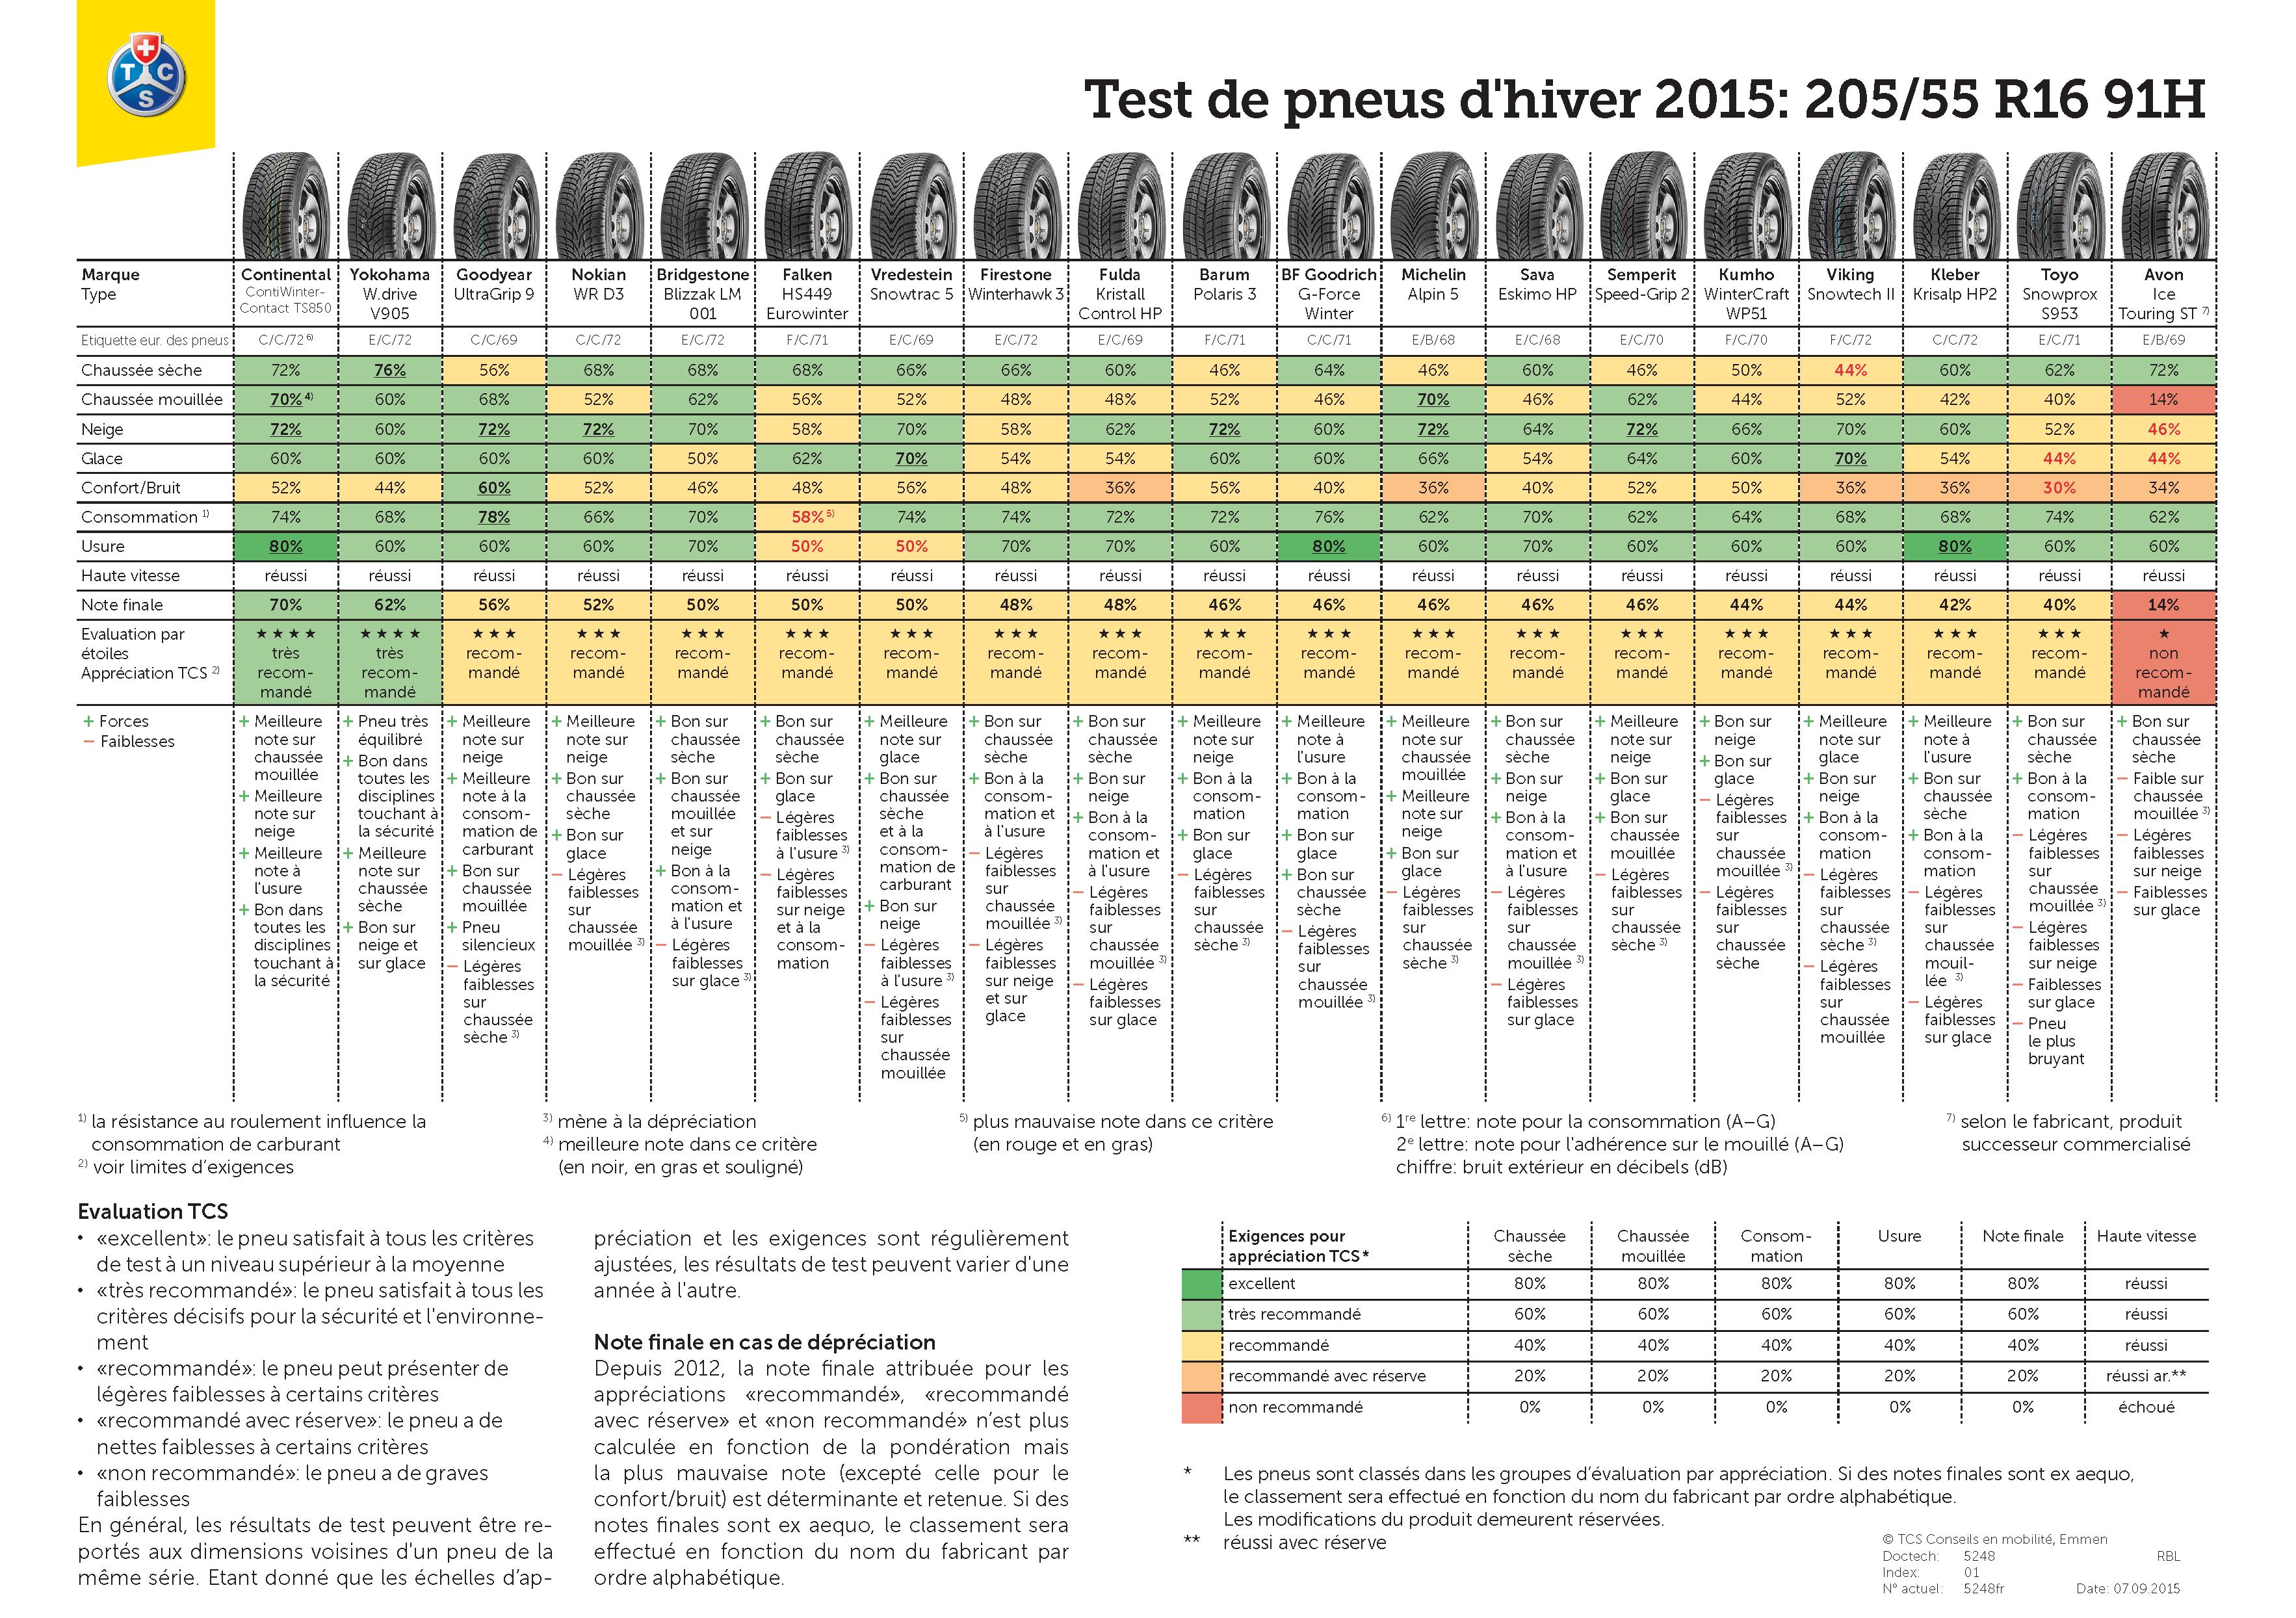 tcs-test-pneus-hiver-2015-resultats-205-55-R16-91H